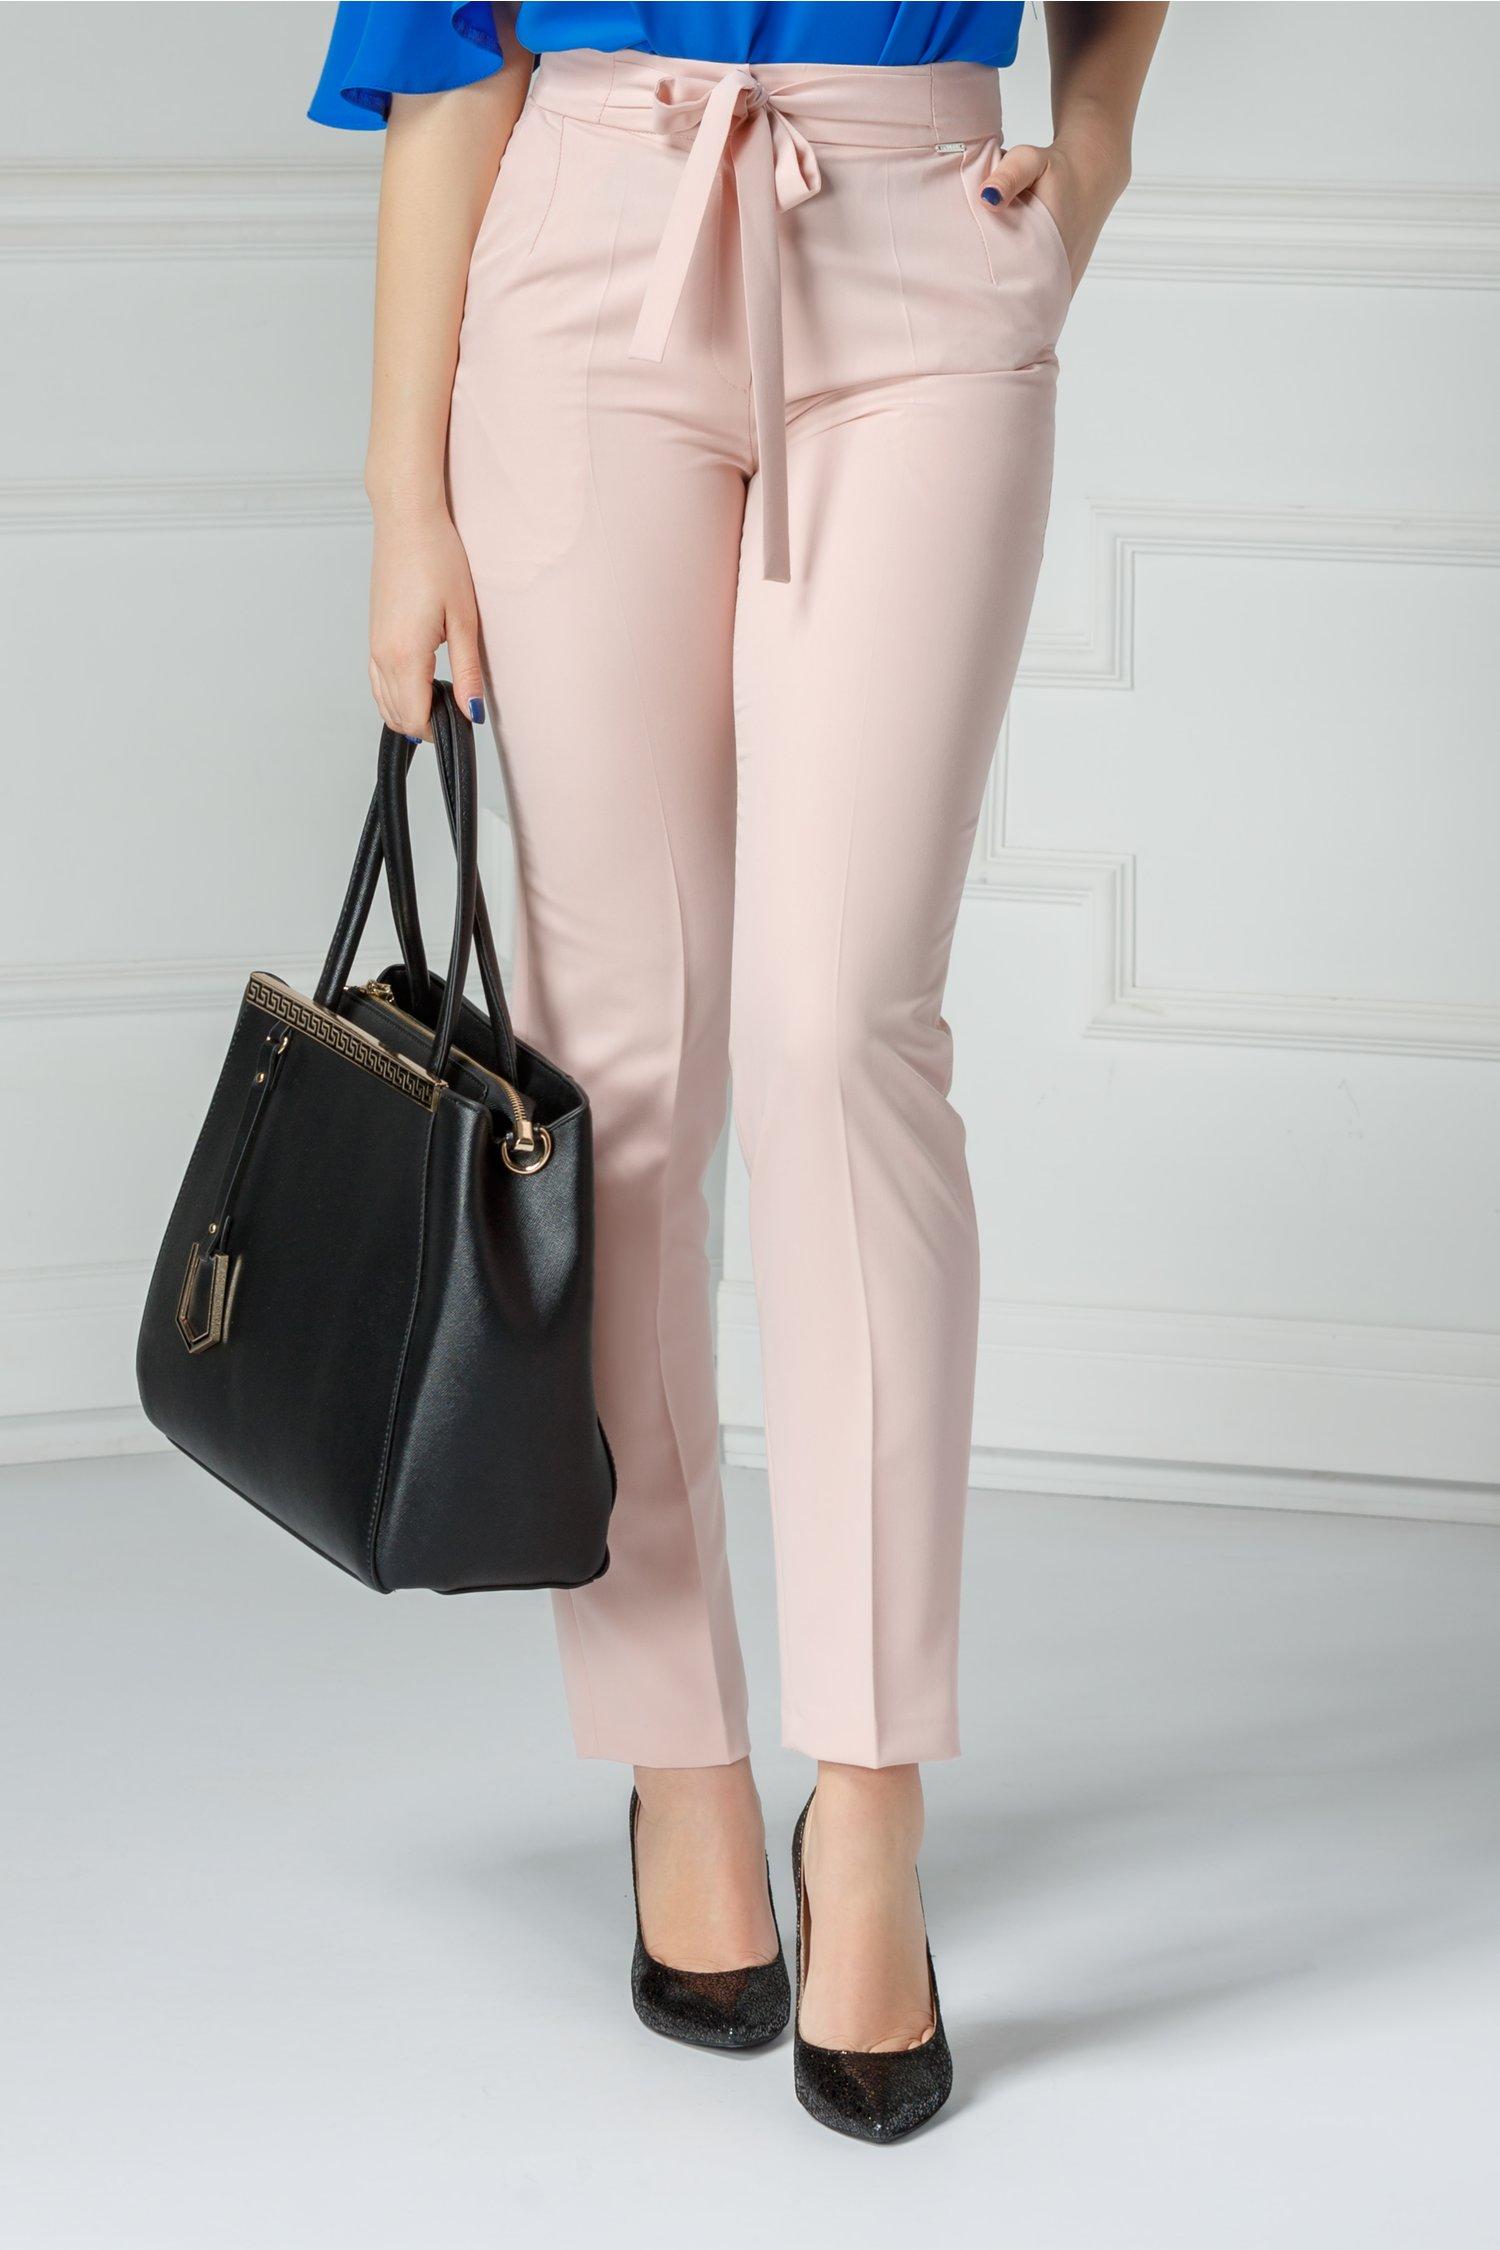 Pantalon Moze Relinda roz praf office